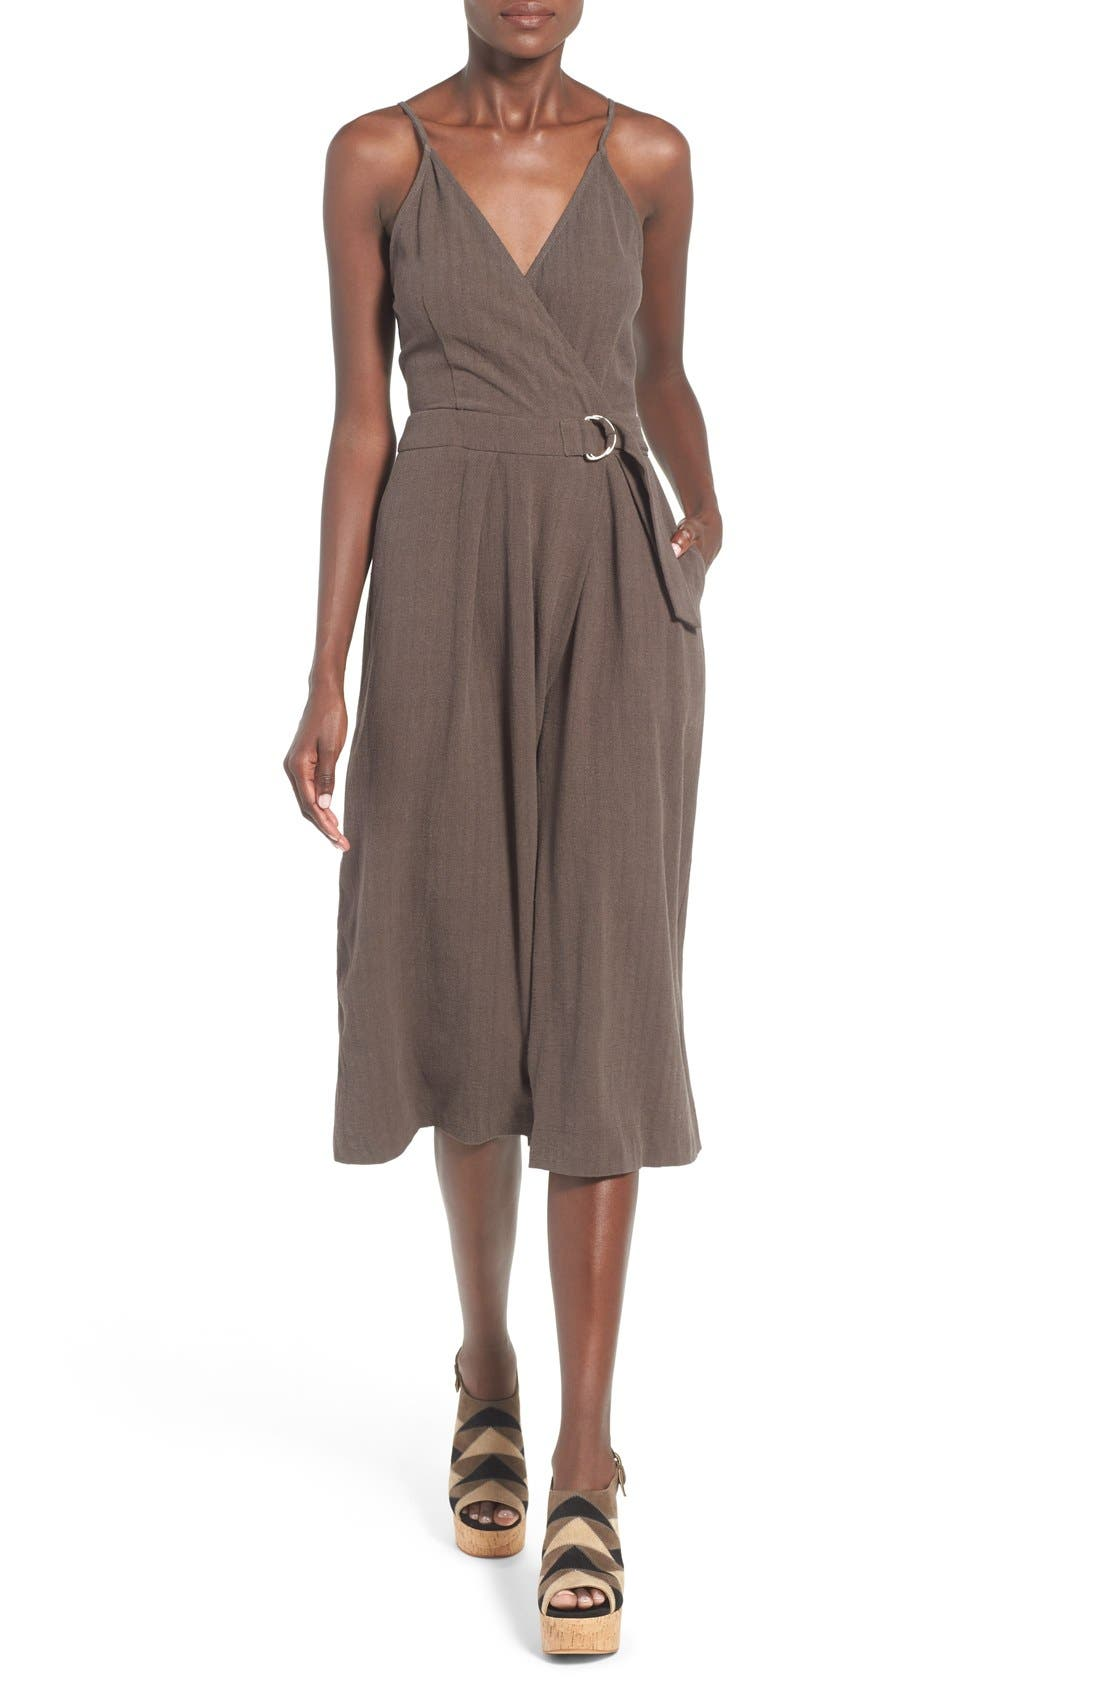 Alternate Image 1 Selected - ASTR 'Peonia' Cotton & Linen Surplice Jumpsuit